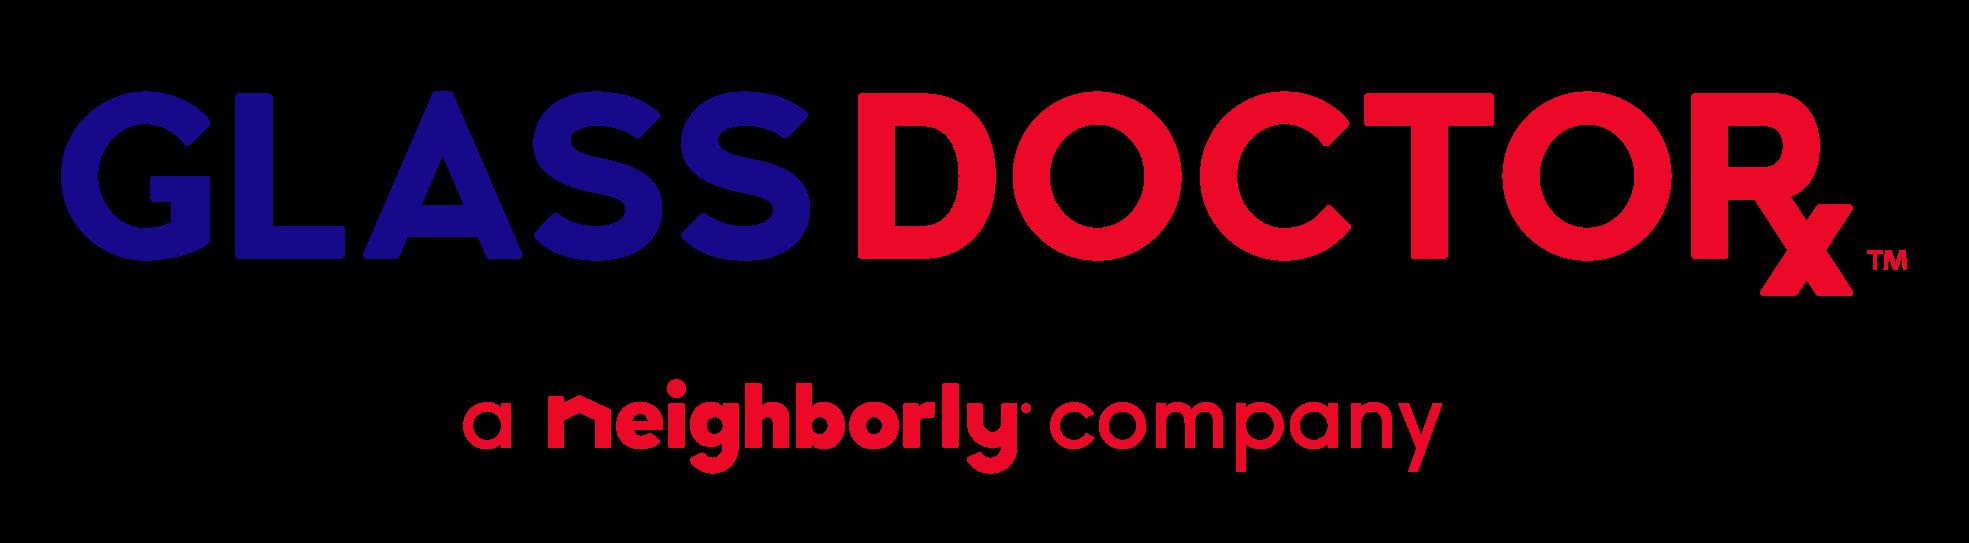 Glass Doctor logo